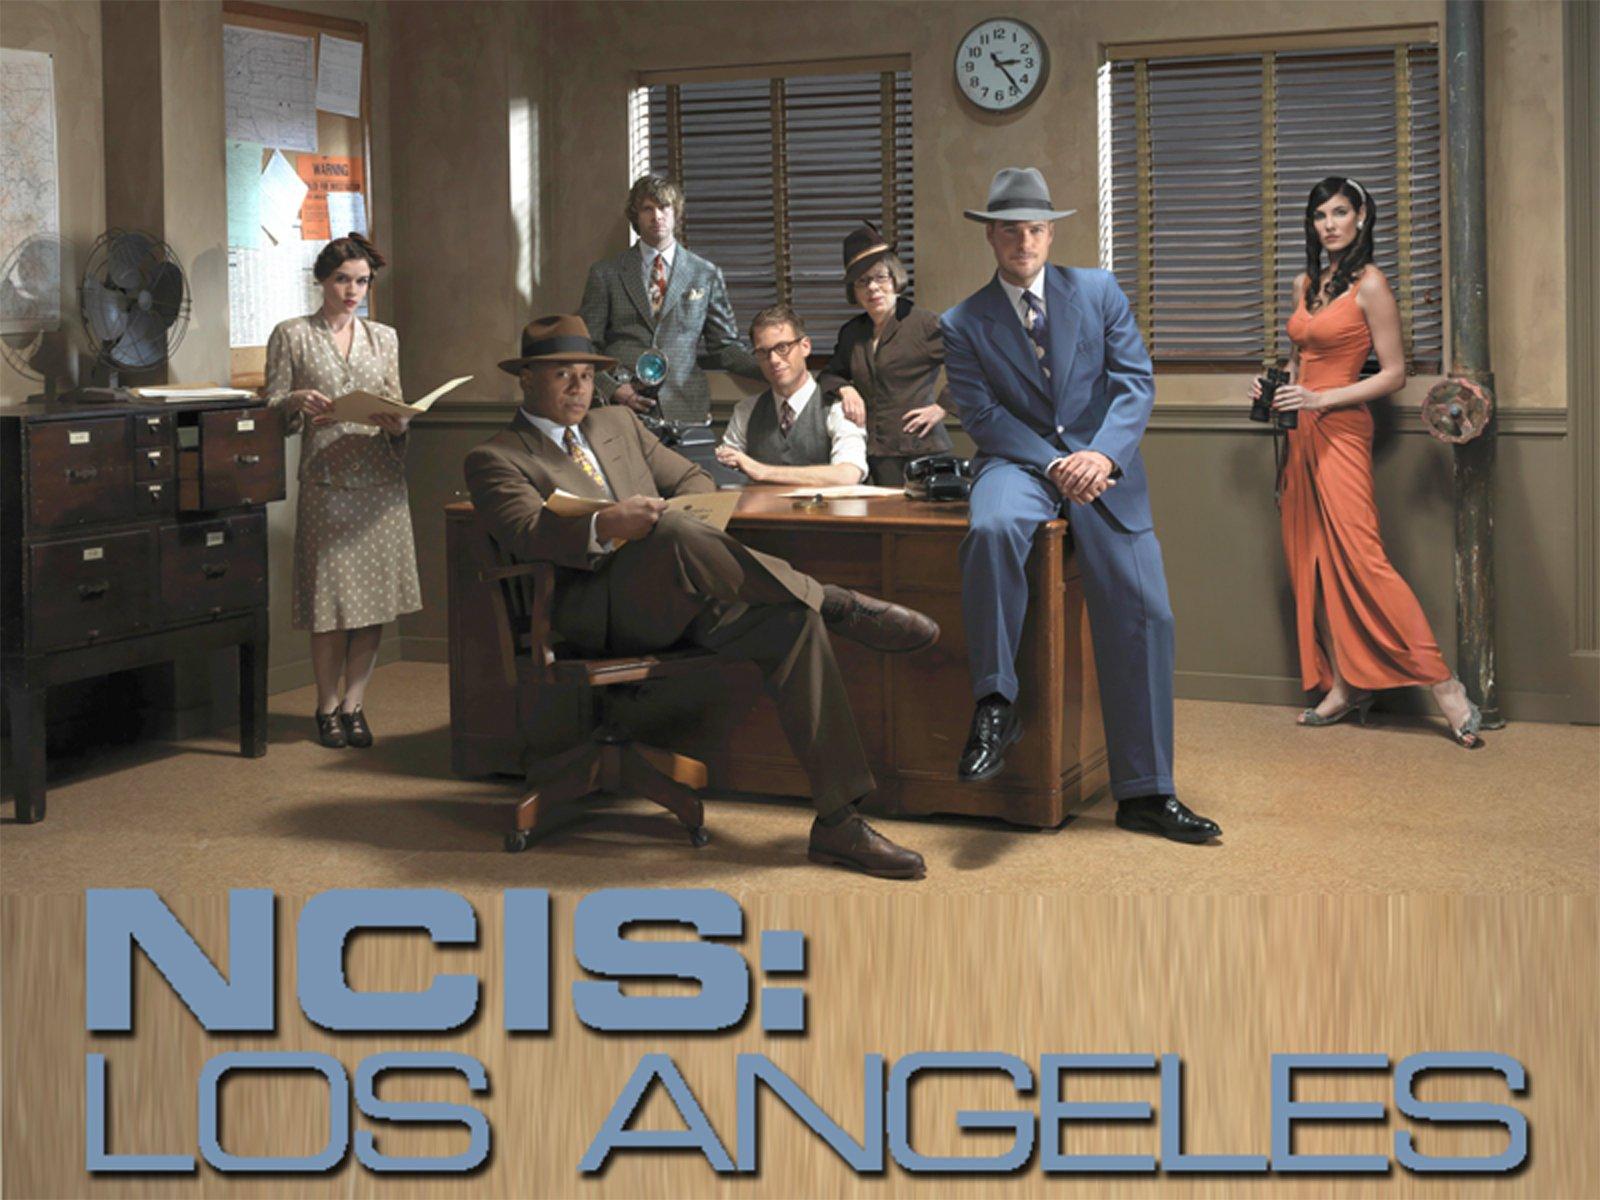 ncis los angeles season 4 episode 6 watch online